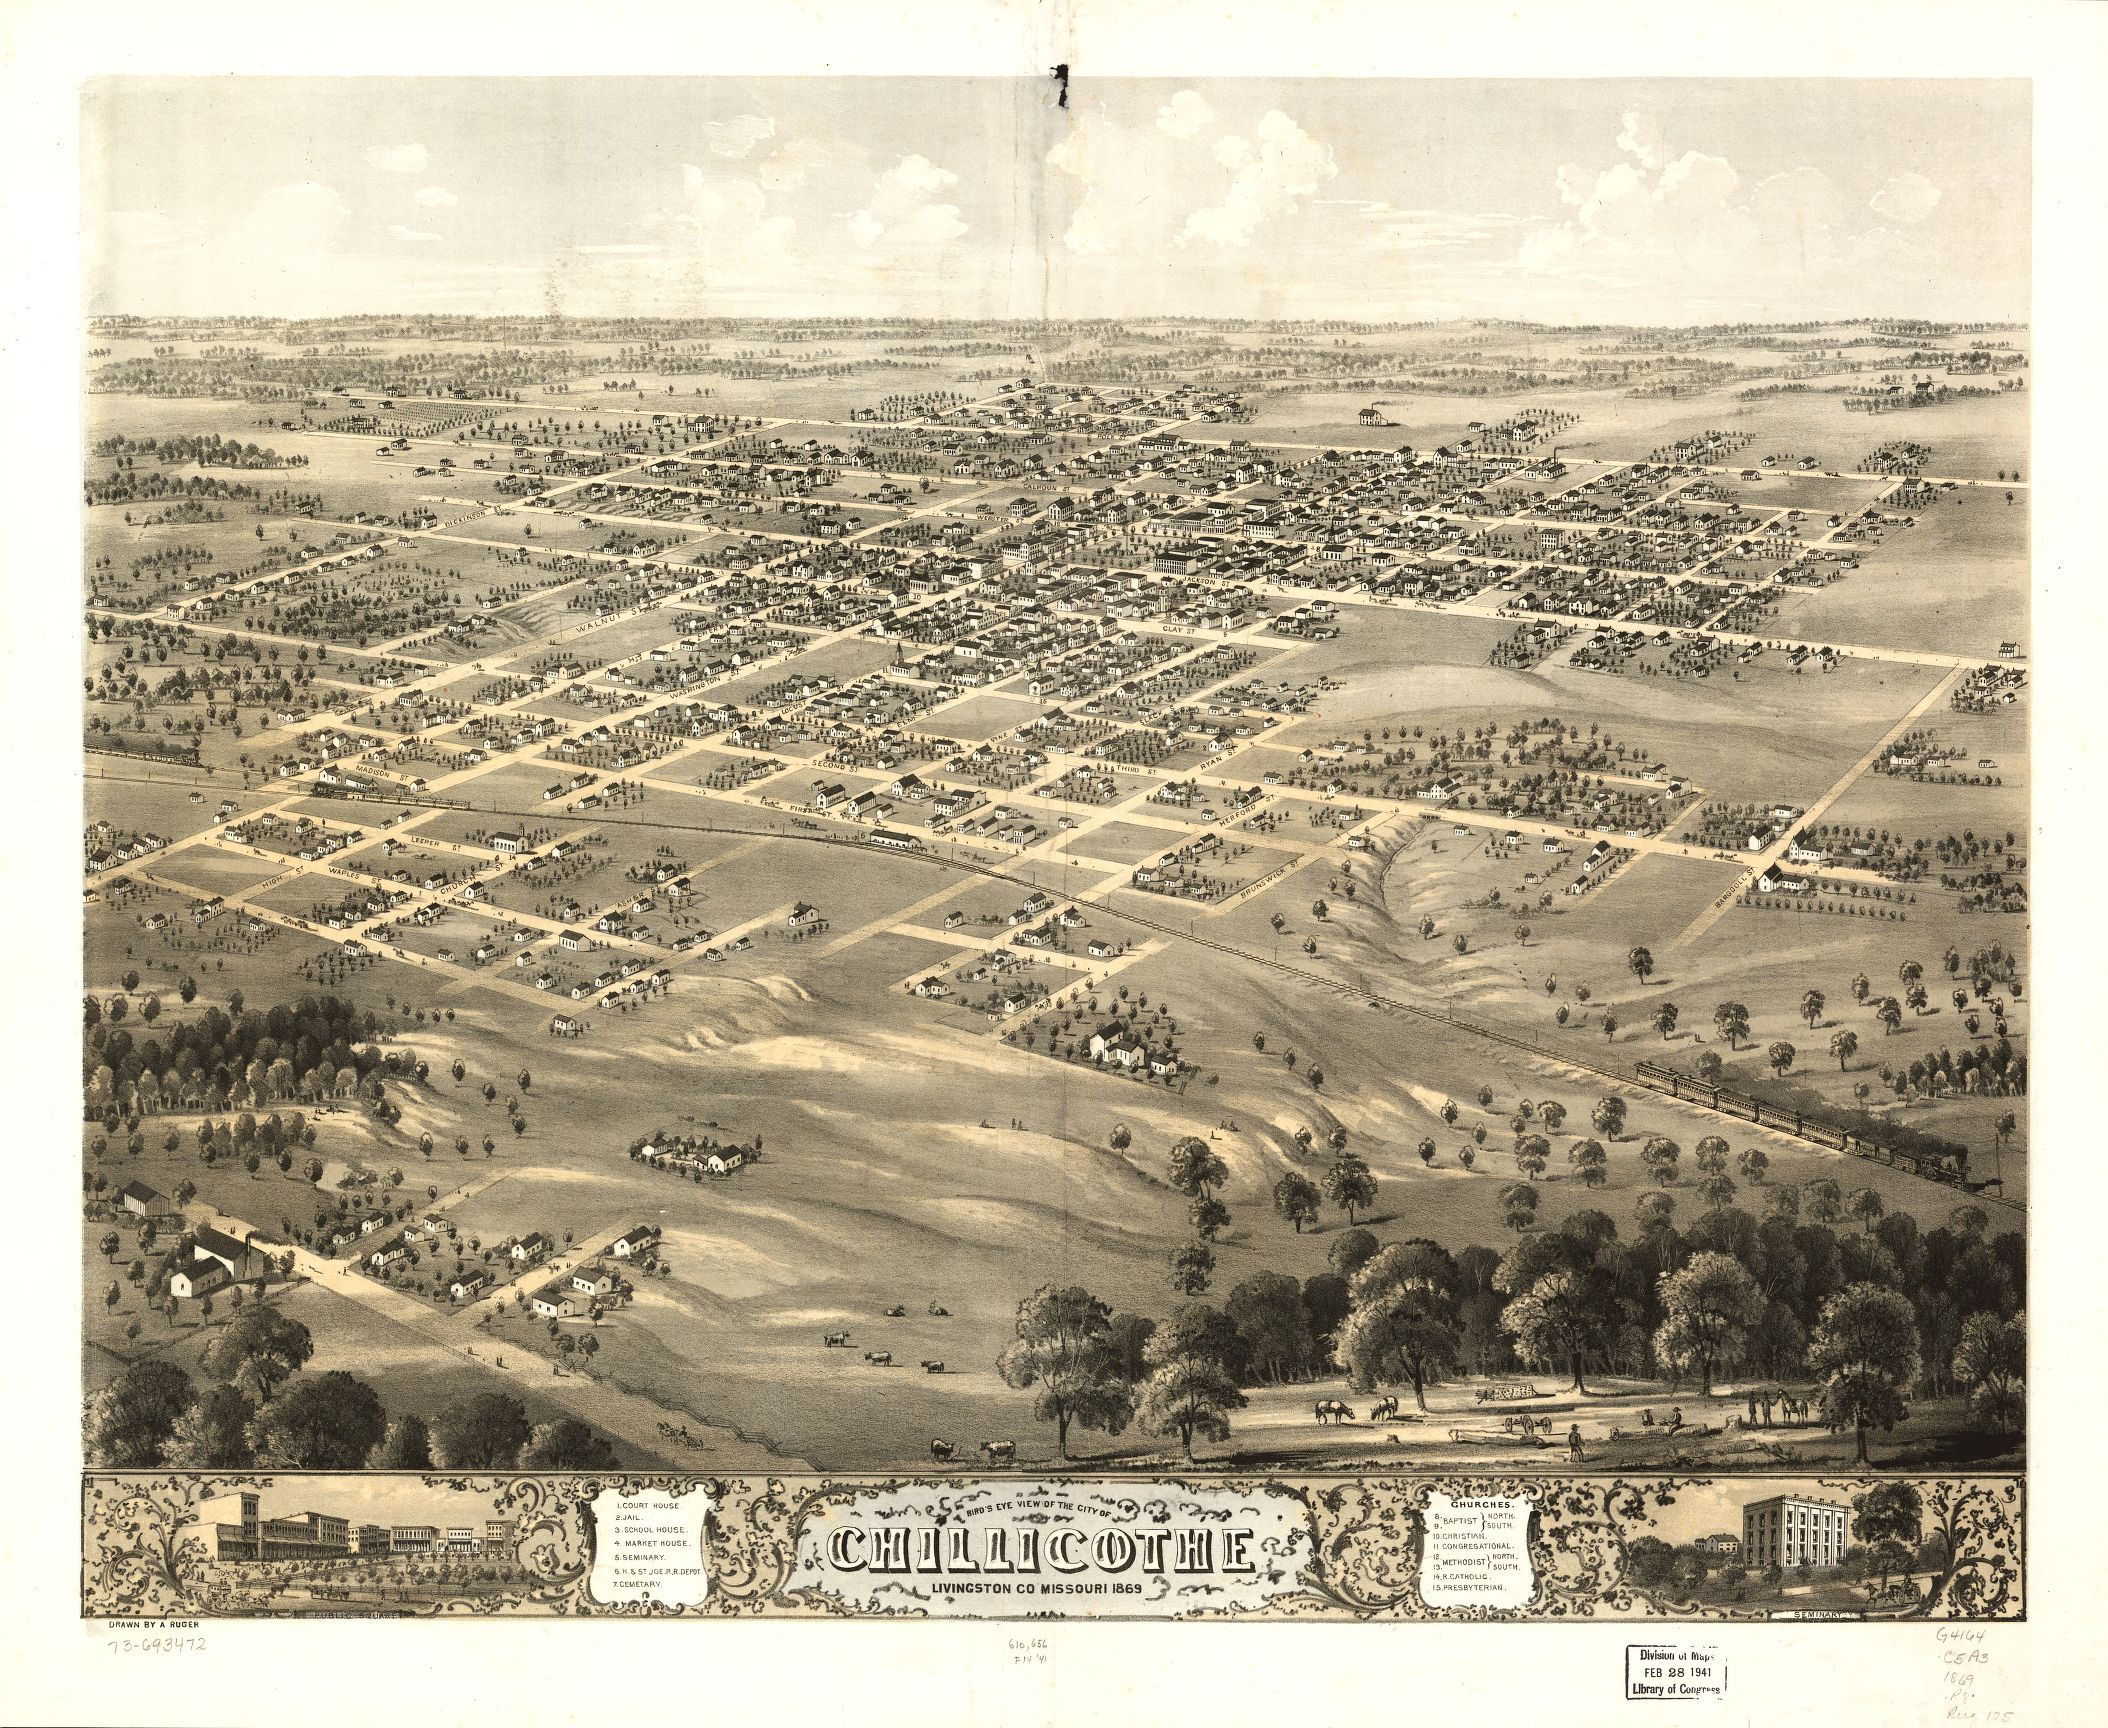 1865 Chillicothe, MO map.jpeg